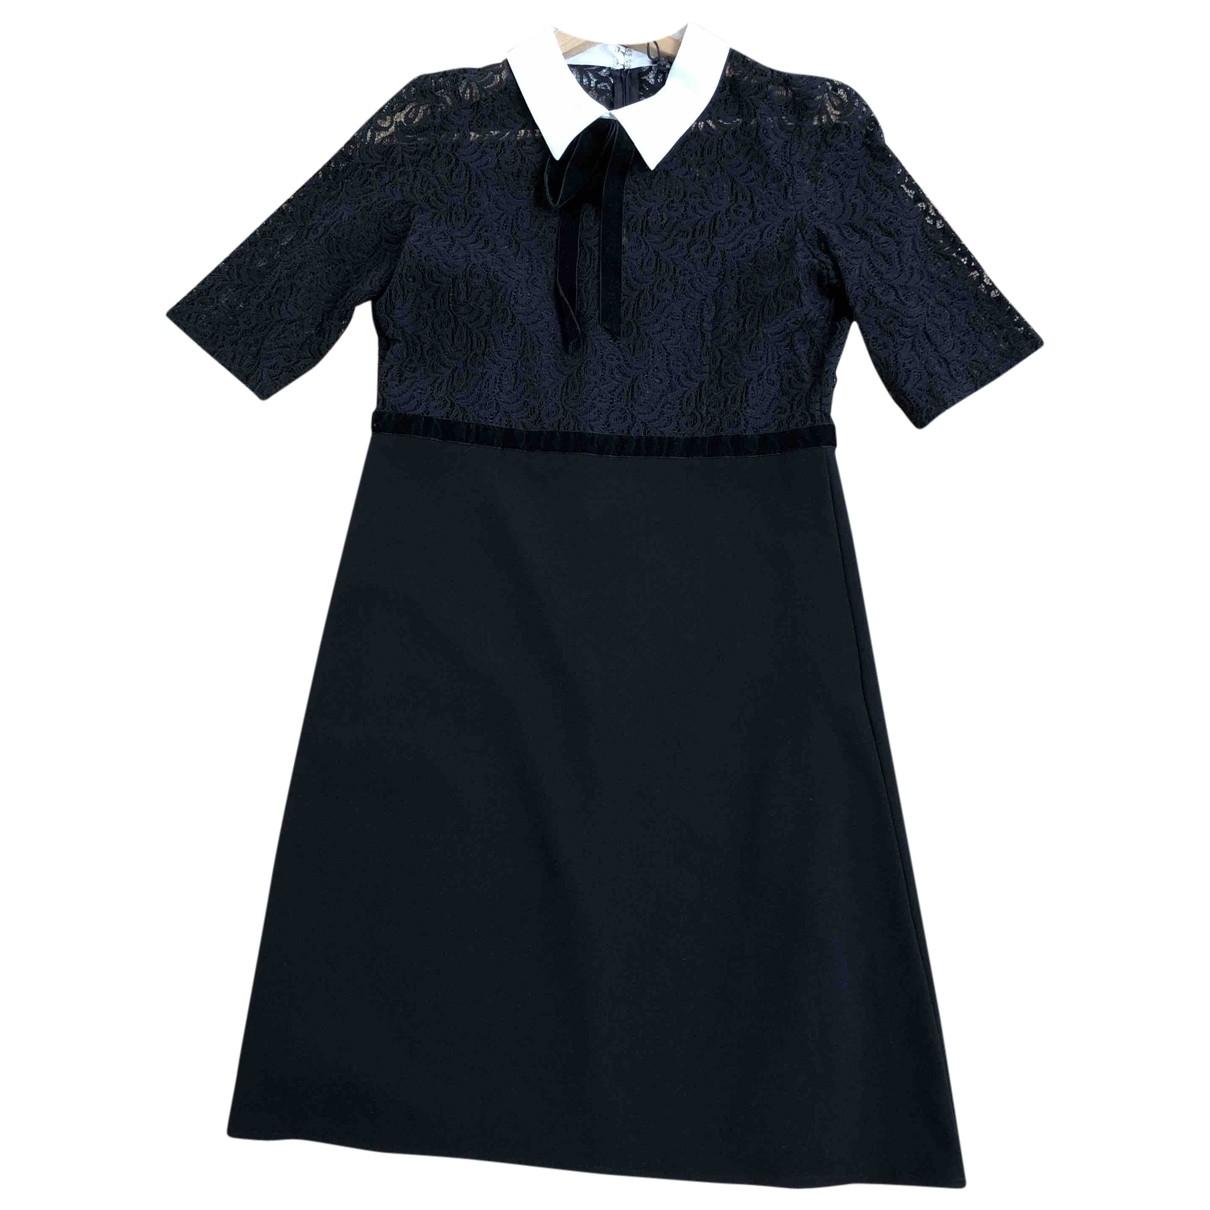 The Kooples \N Black Cotton dress for Women 34 FR